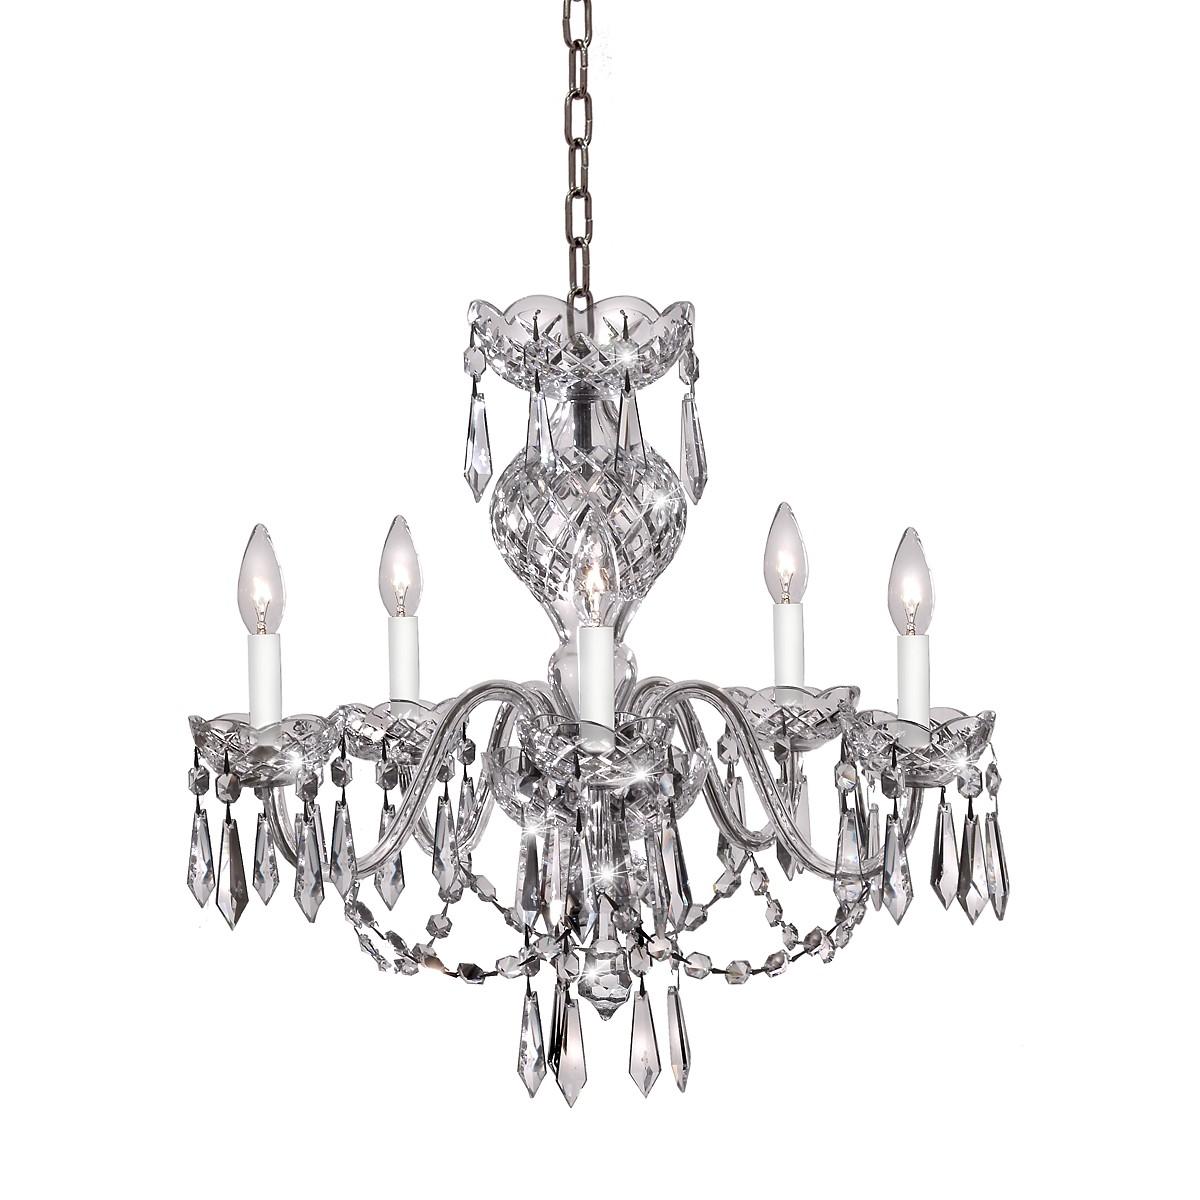 Waterford comeragh 5 arm chandelier bloomingdales pdpimgshortdescription arubaitofo Choice Image